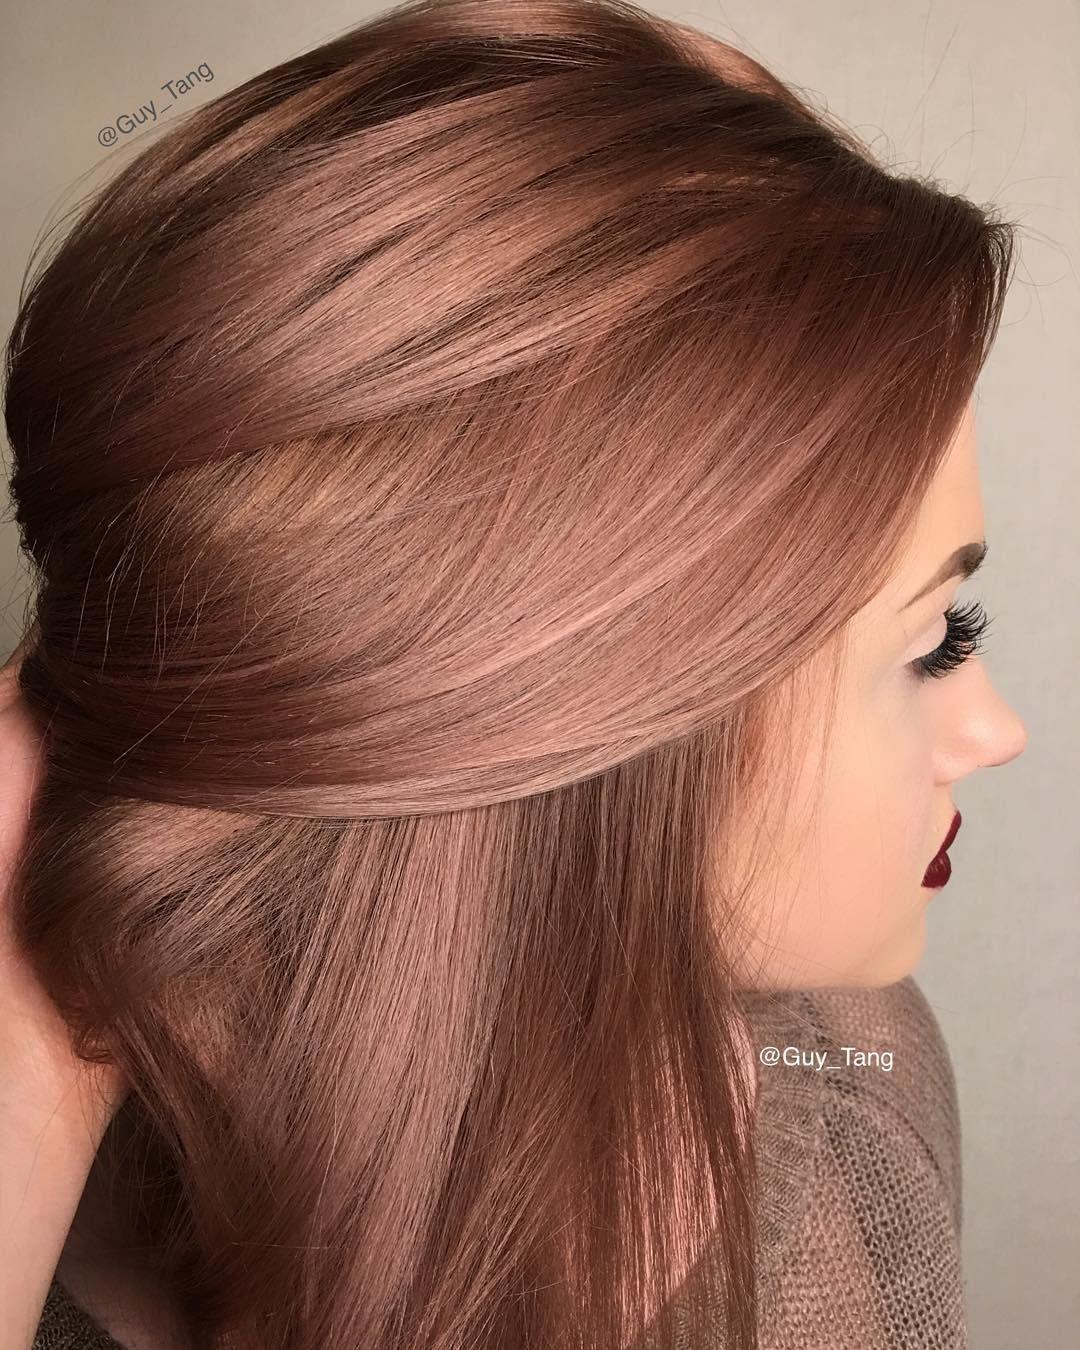 Hairbestie mykie is getting the new wedontknow metallic obsession